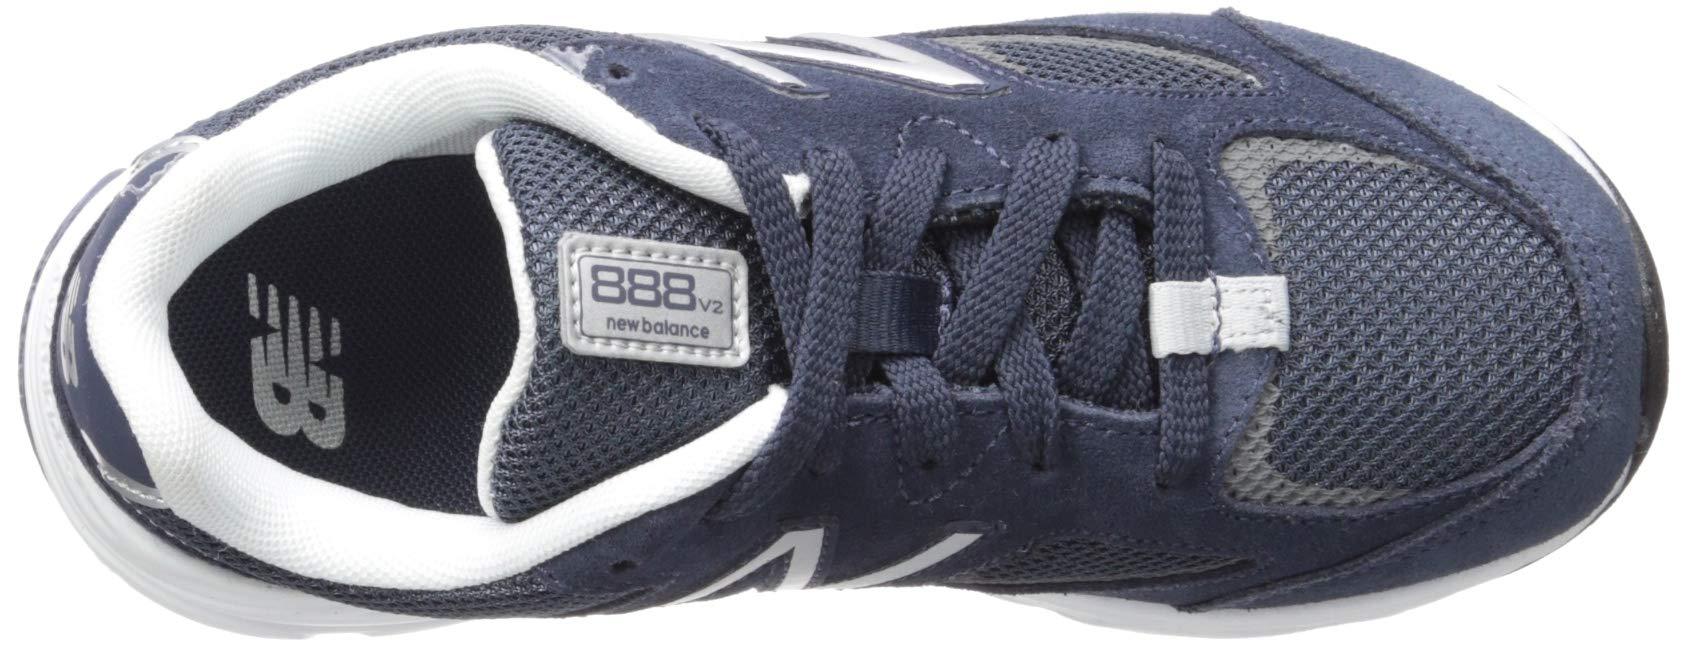 New Balance Boys' 888v2 Running Shoe, Navy/Grey, 2.5 M US Little Kid by New Balance (Image #8)